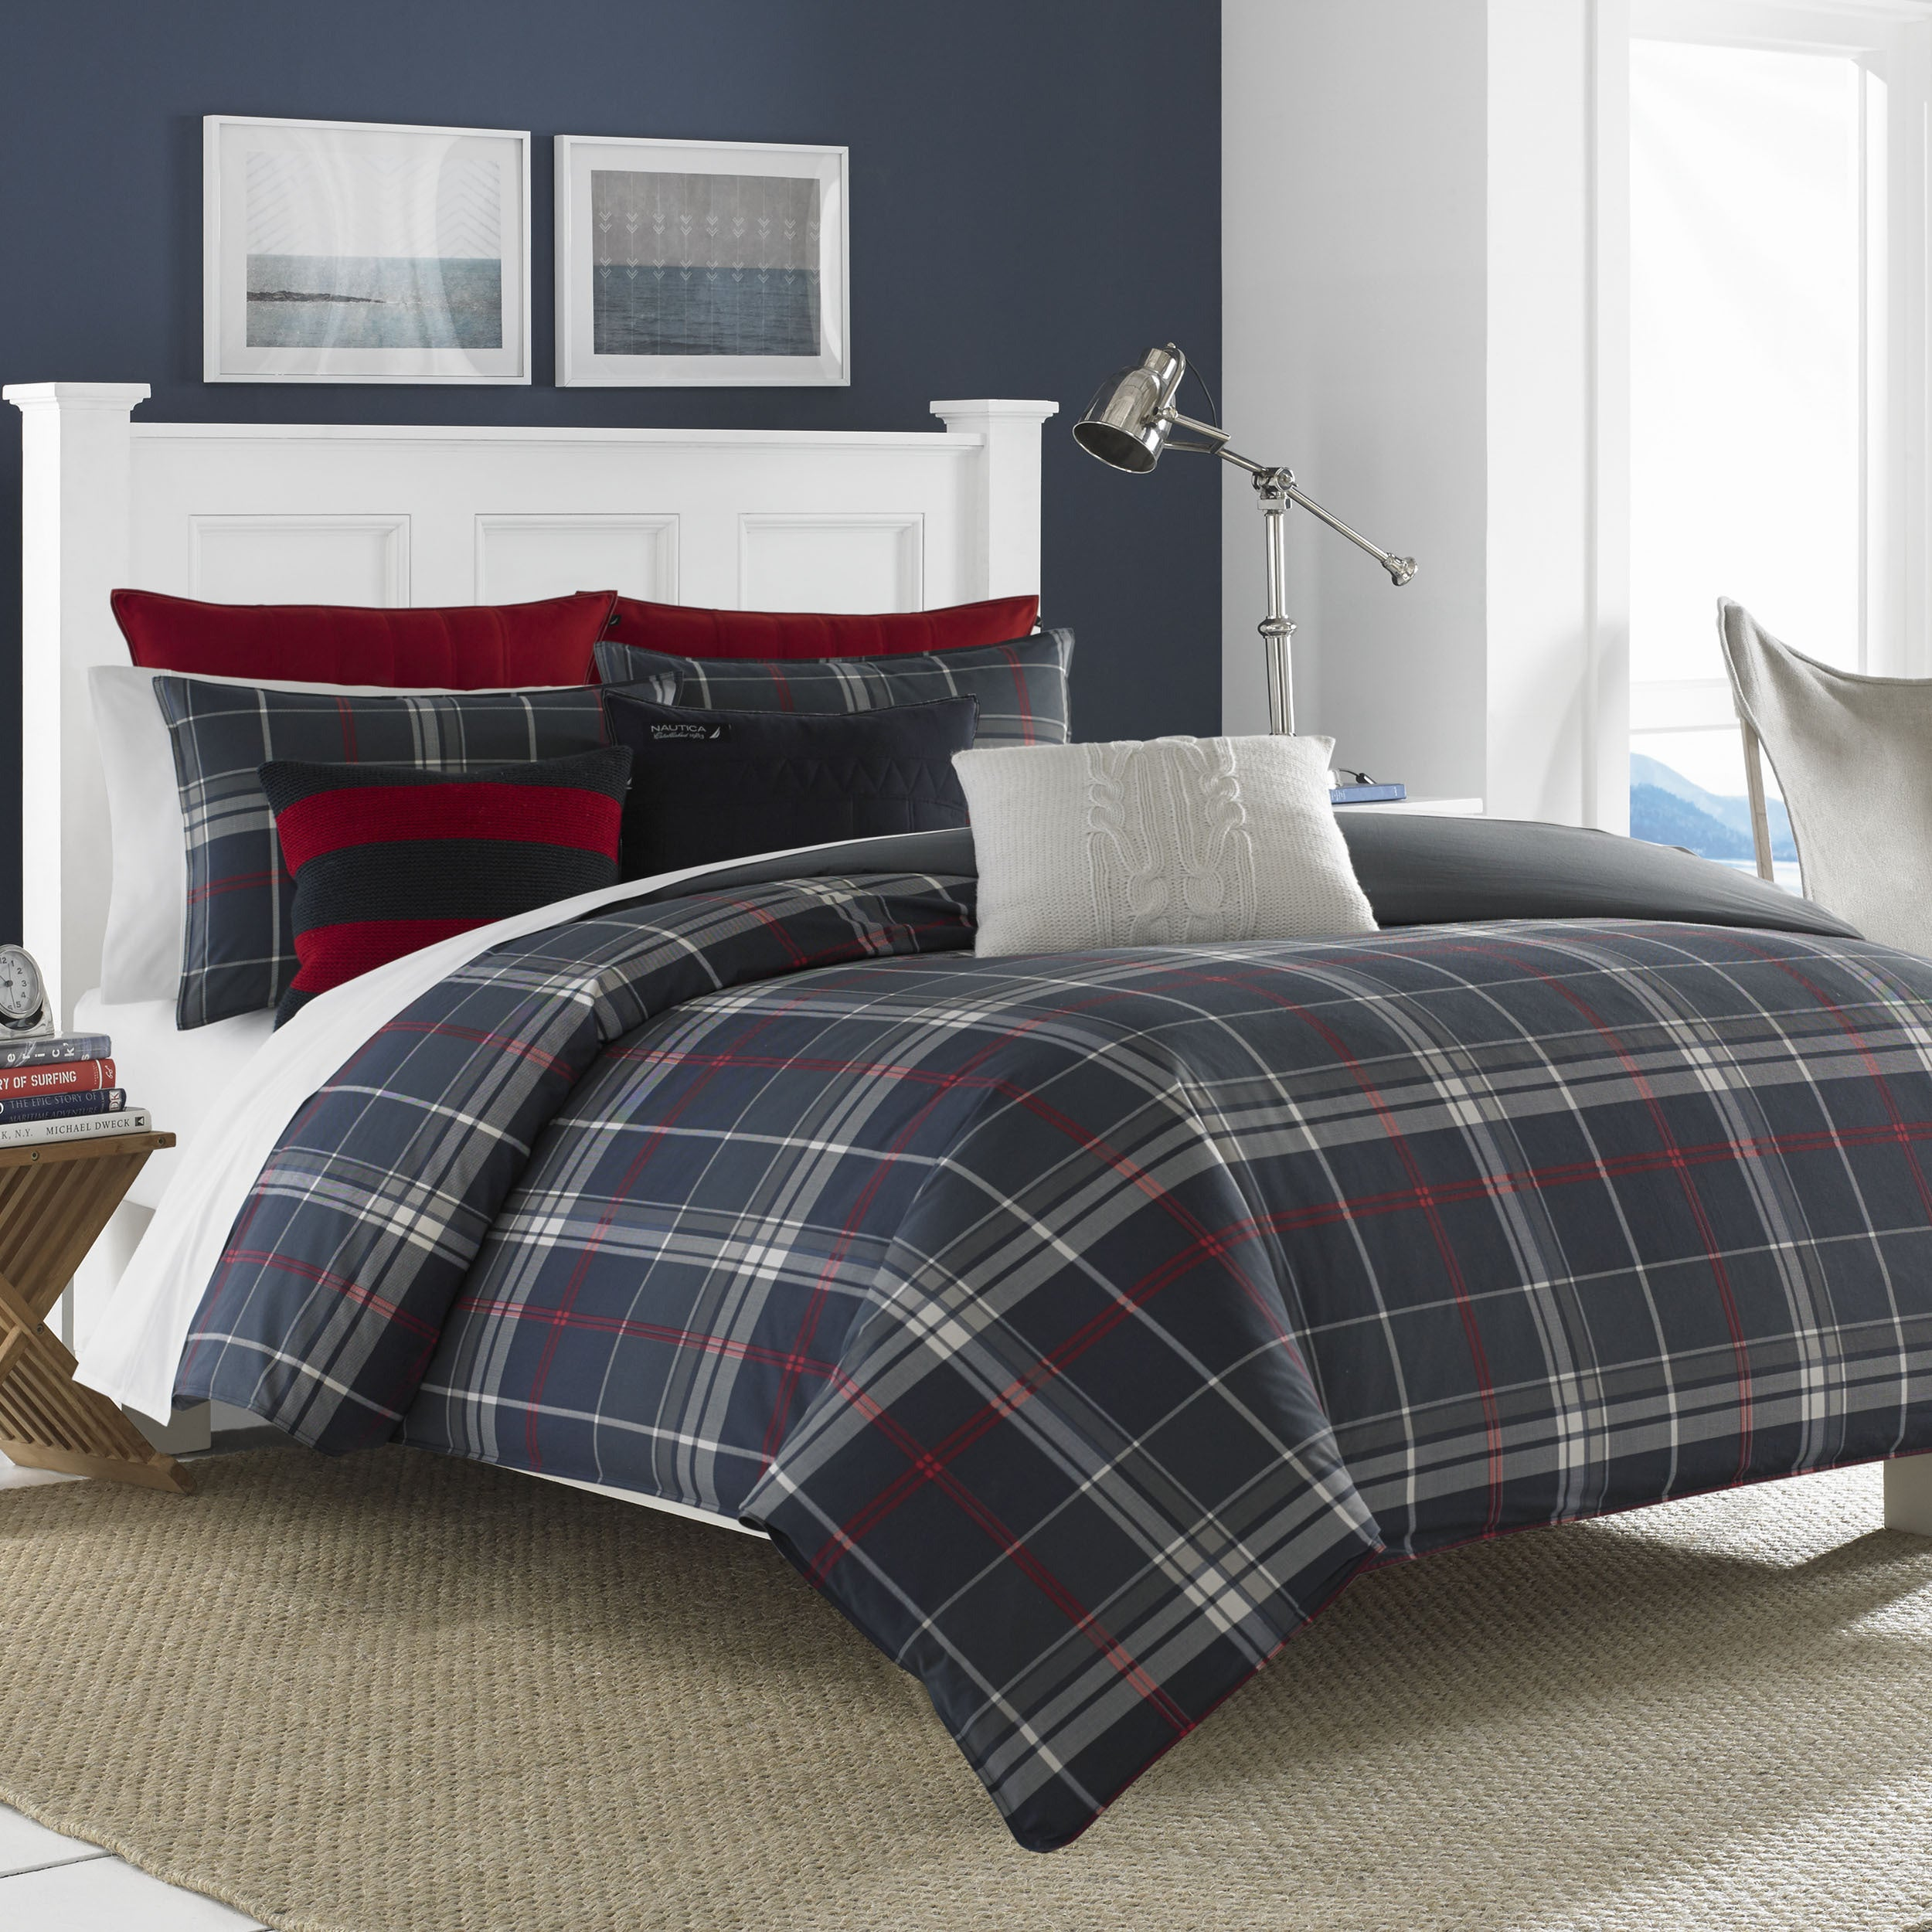 Nautica Booker Navy Cotton Comforter Set - Free Shipping Today -  Overstock.com - 18424182